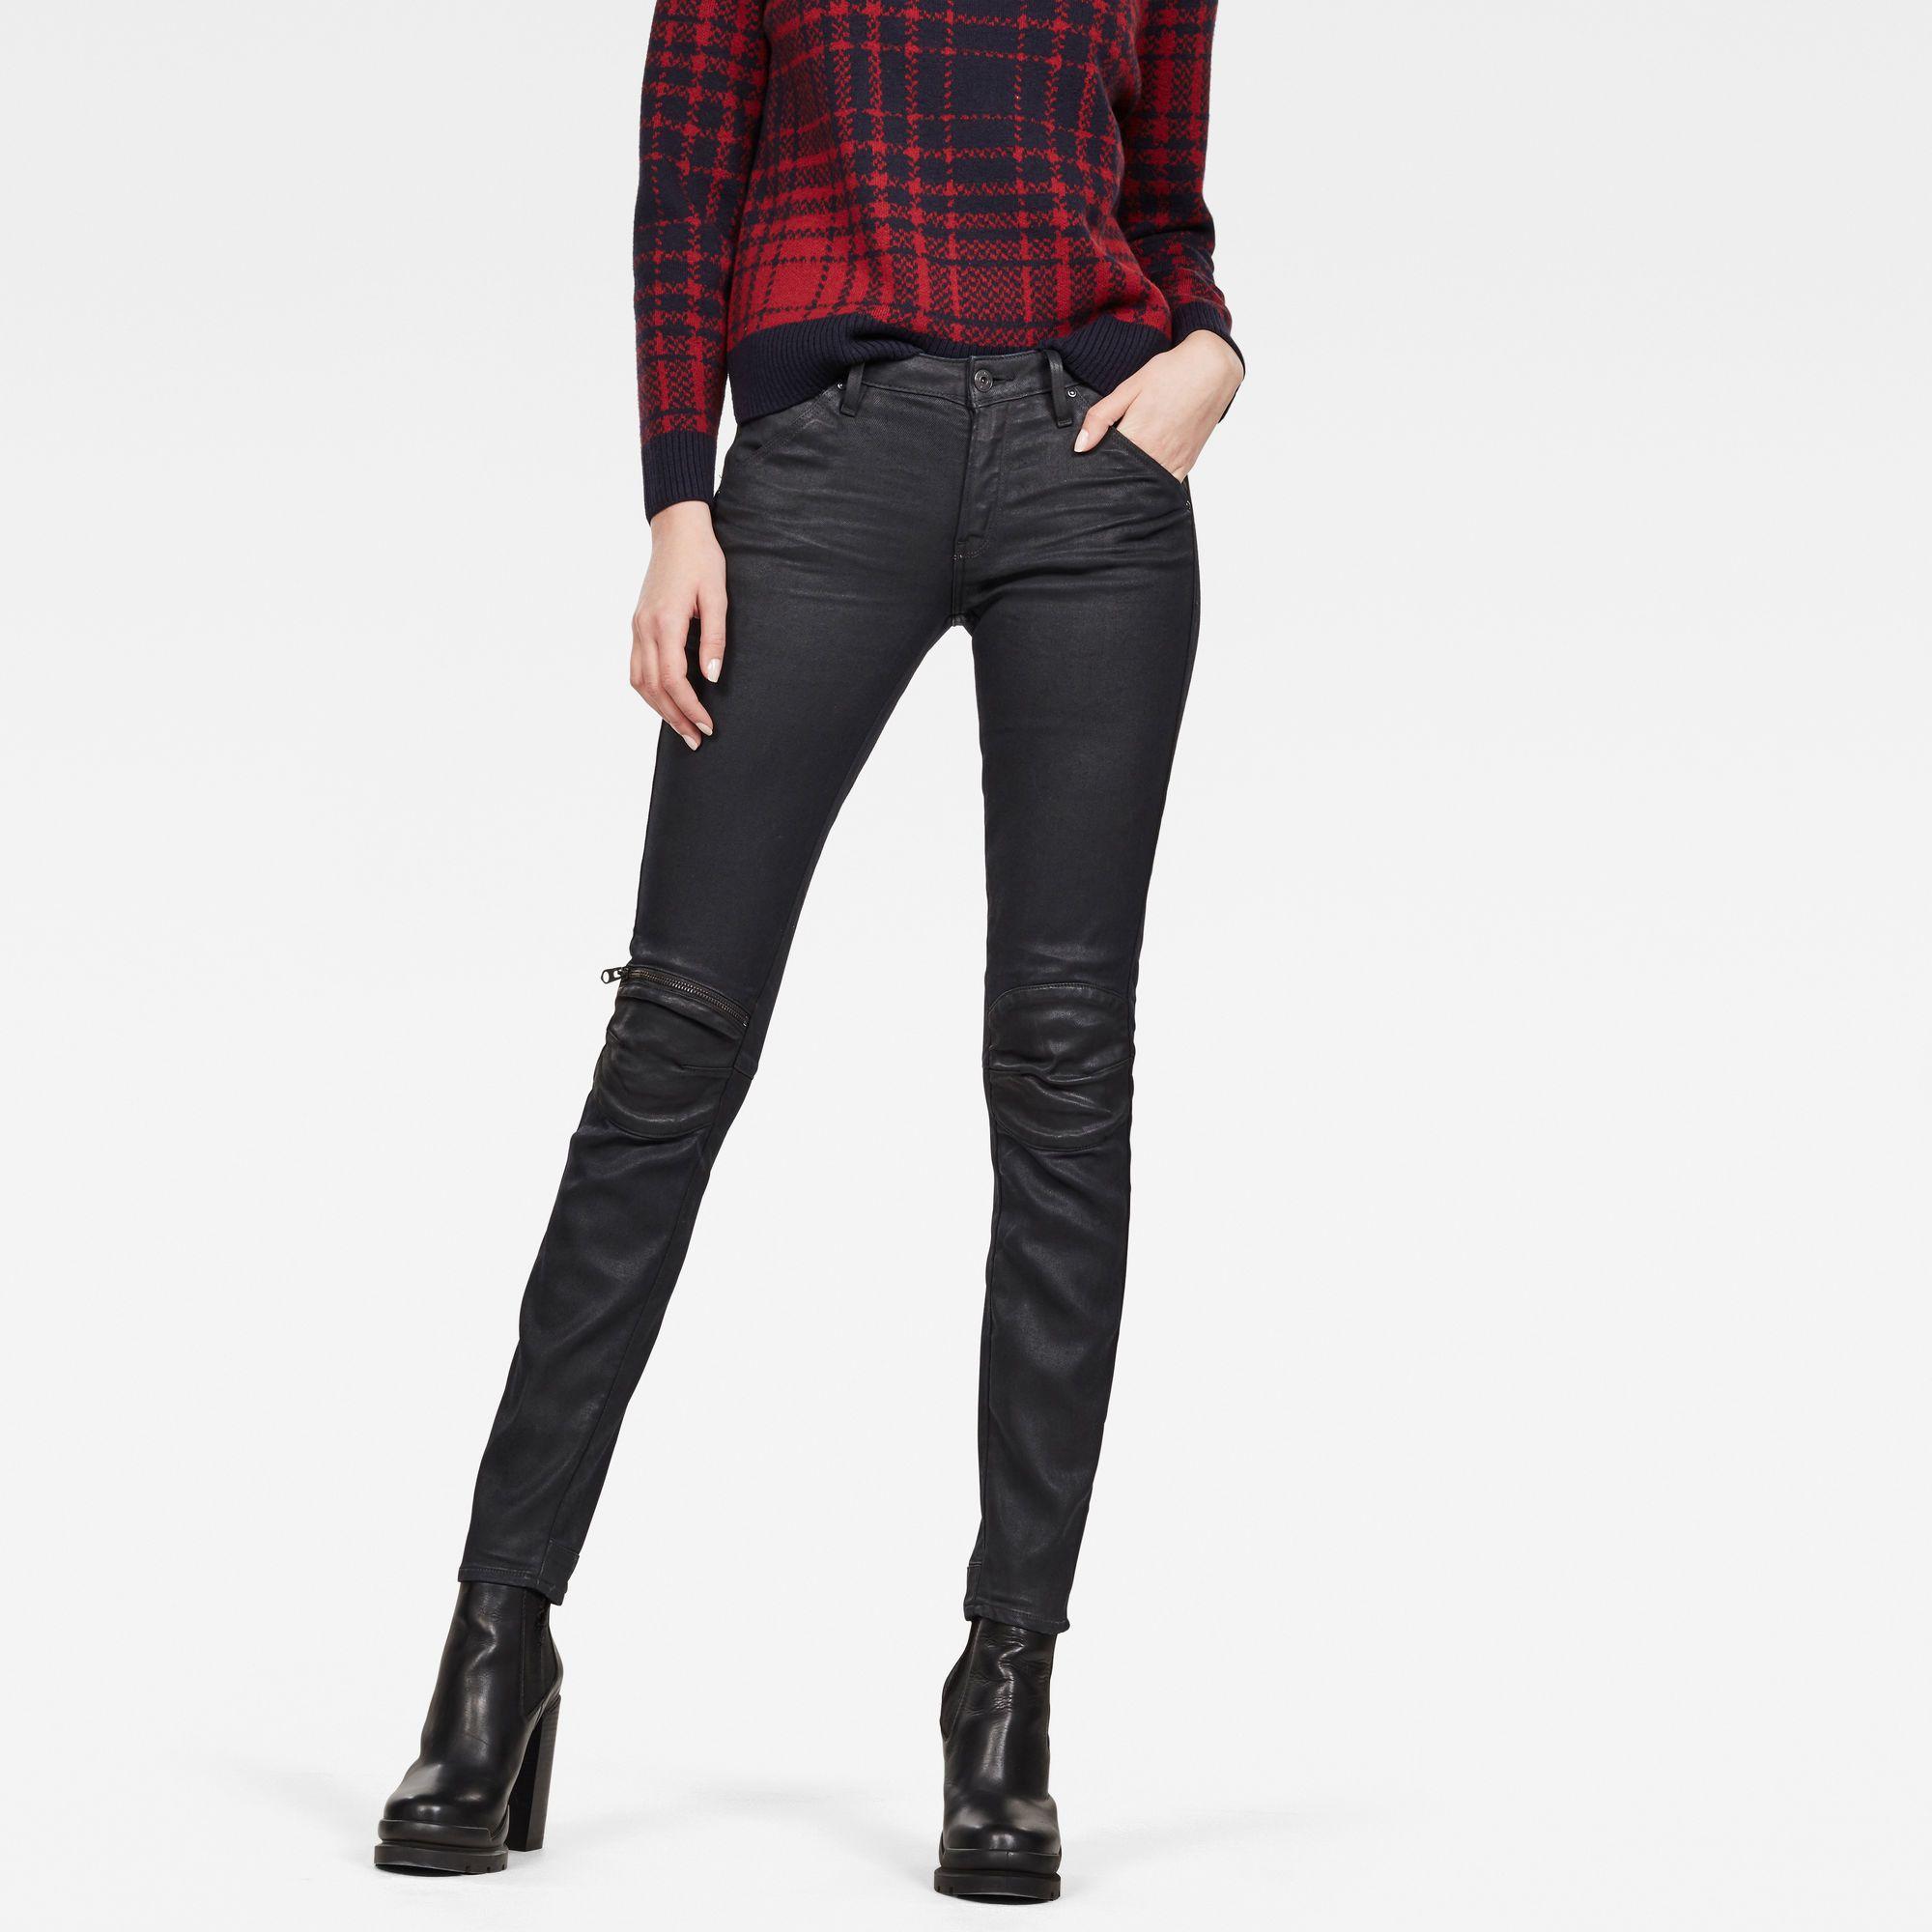 G-Star RAW 5622 Knee Zip Mid Skinny Jeans